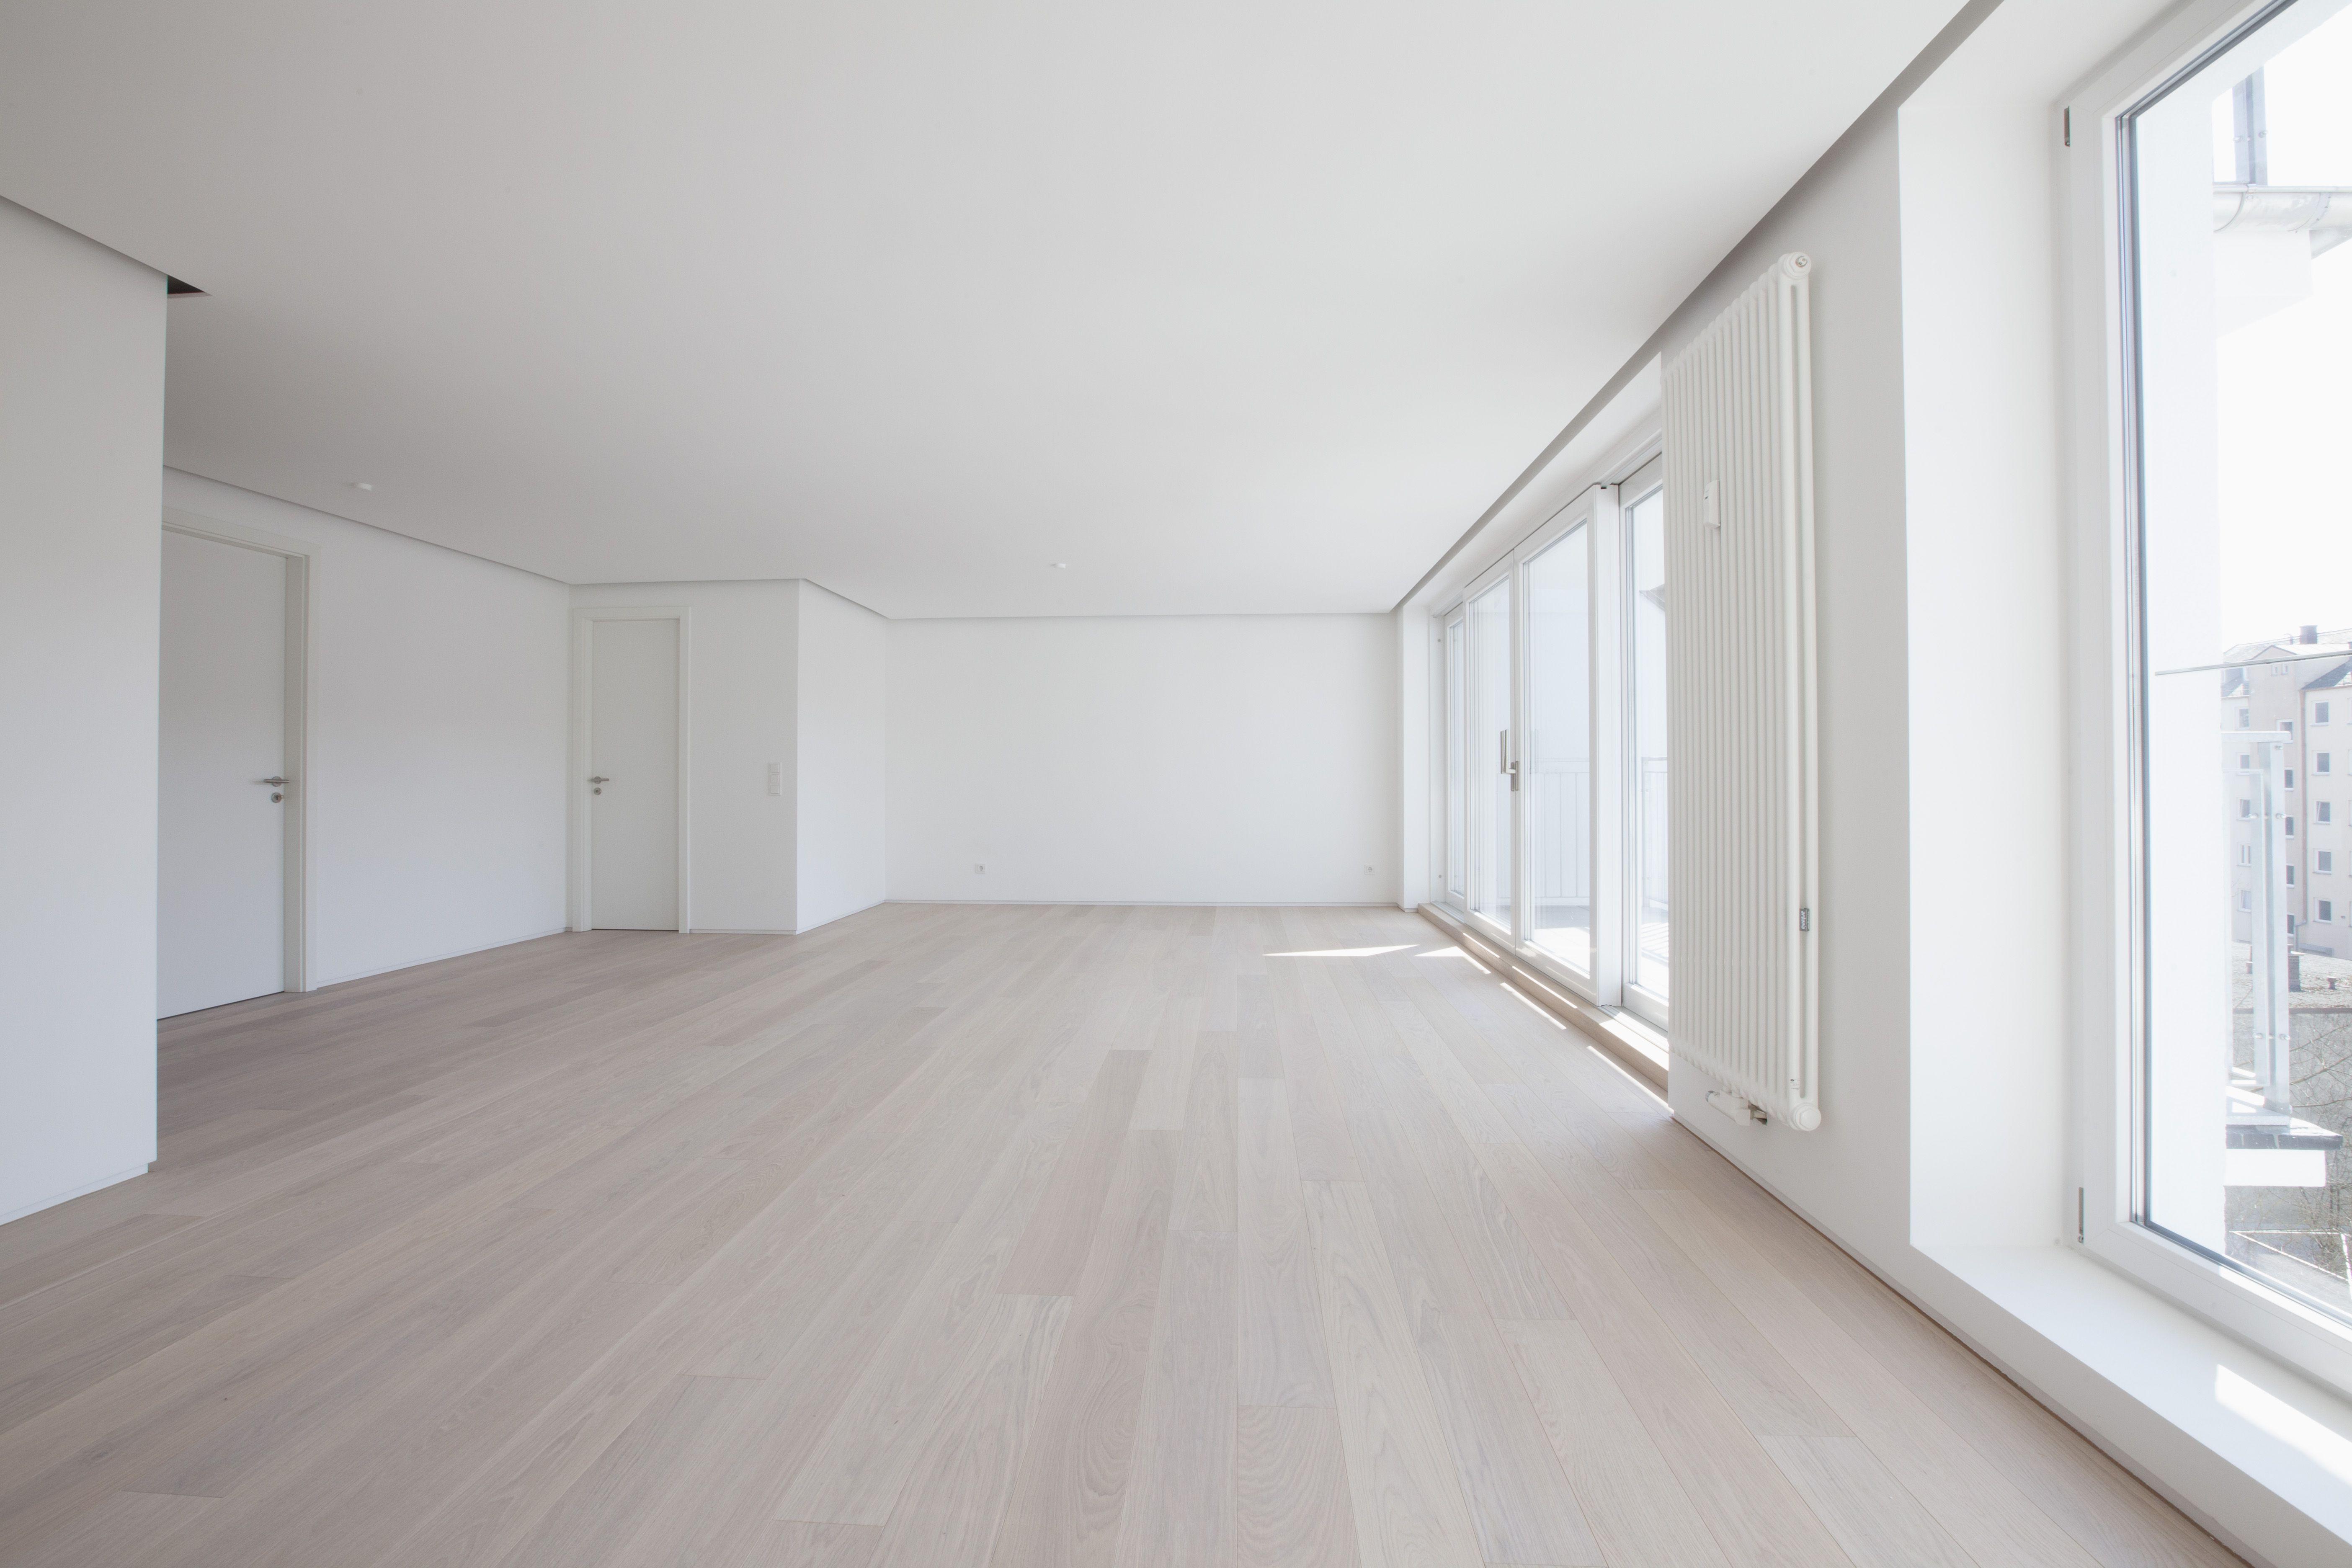 1 1 2 wide oak hardwood flooring of basics of favorite hybrid engineered wood floors throughout empty living room in modern apartment 578189139 58866f903df78c2ccdecab05